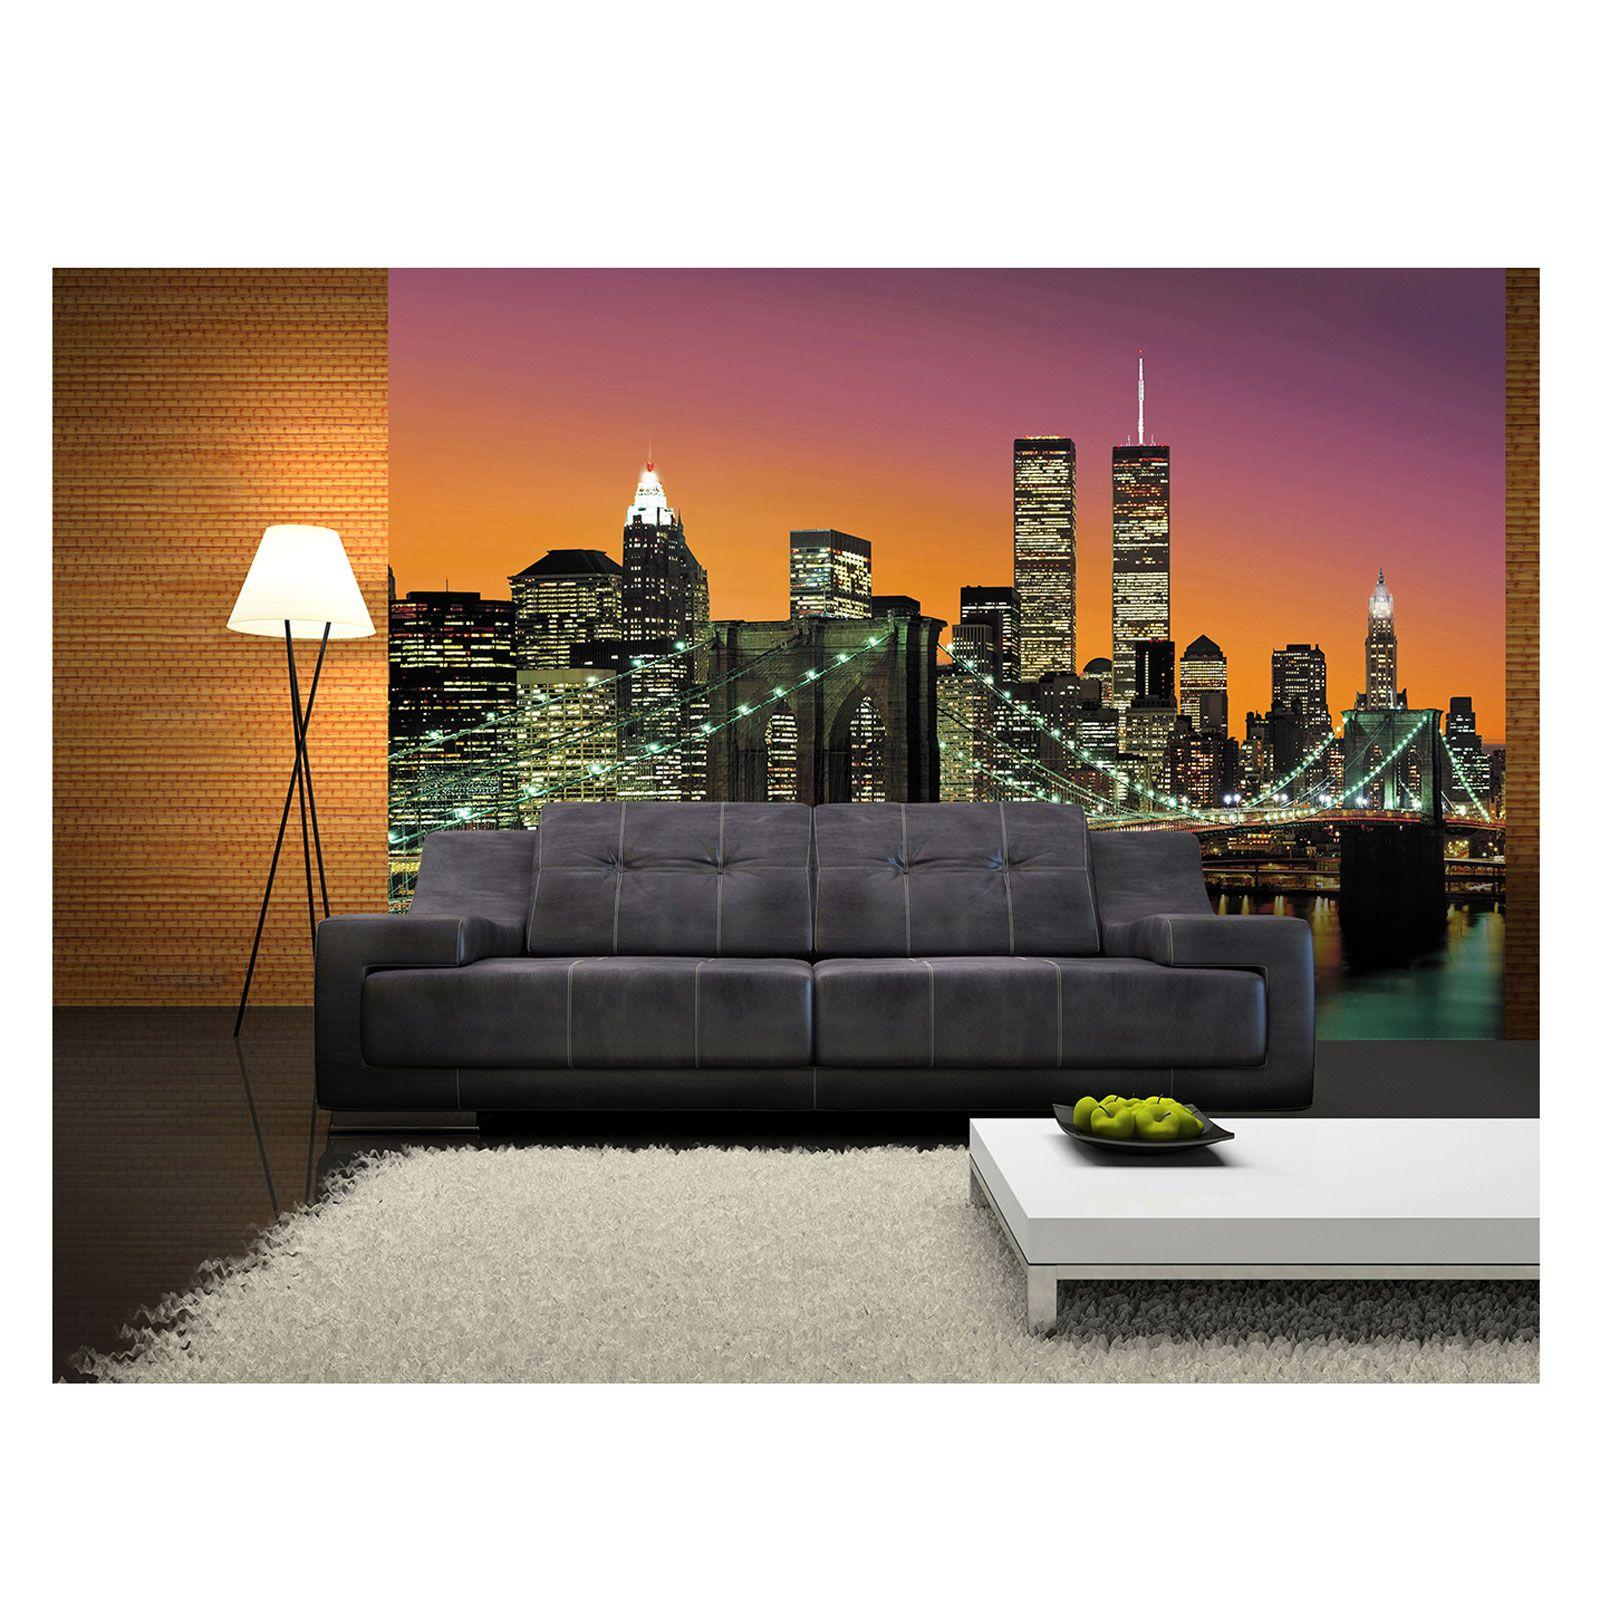 vlies fototapete new york city 8 teilig tapete 366x254cm bildtapete collections city foto tapete. Black Bedroom Furniture Sets. Home Design Ideas